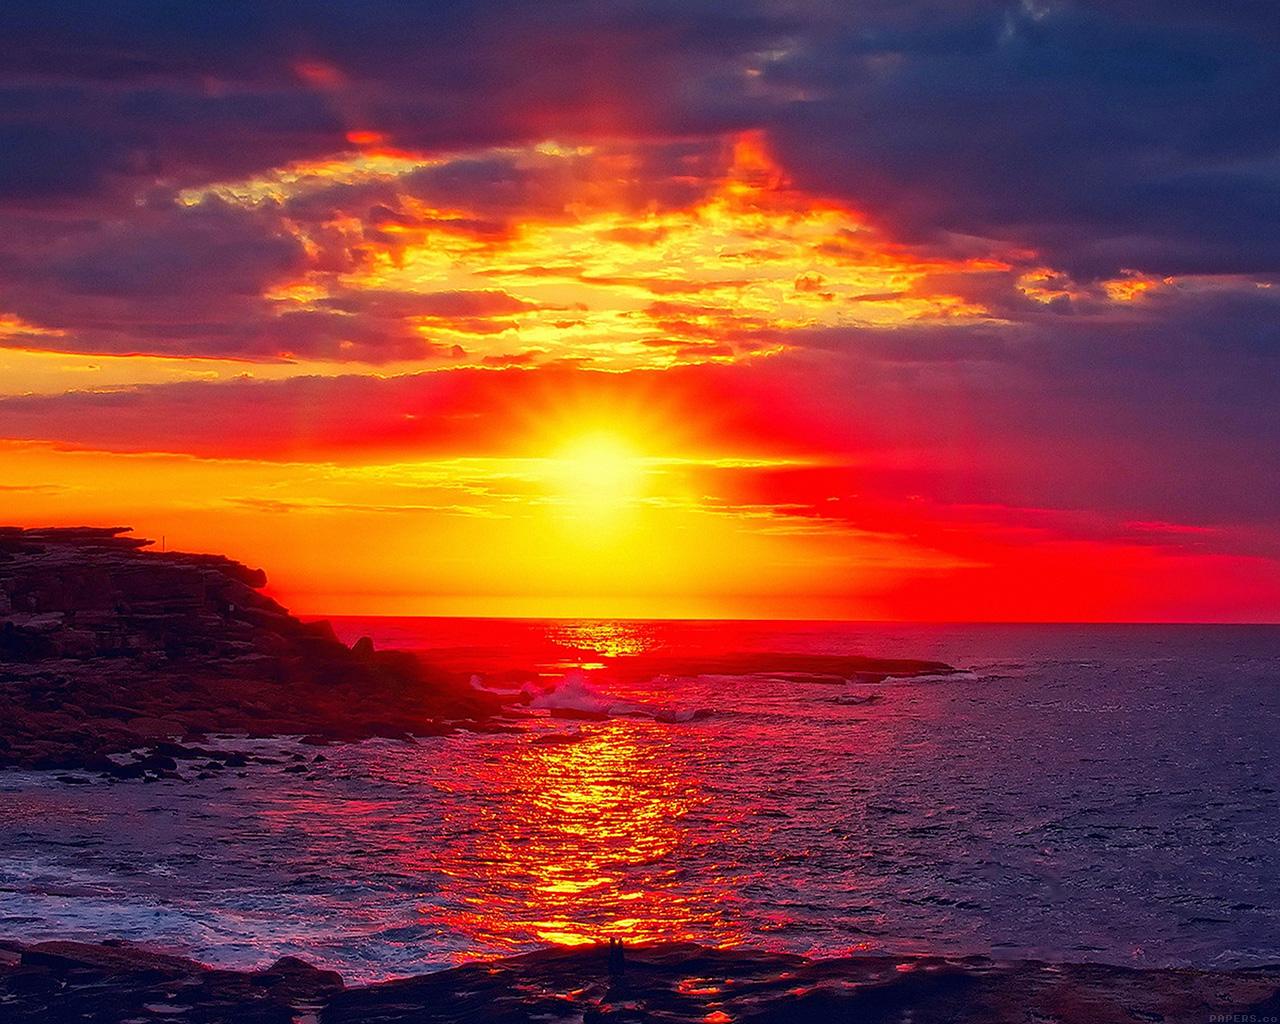 Waikiki Beach Ipad Air Wallpaper: Mk46-sunset-beach-nature-afternoon-love